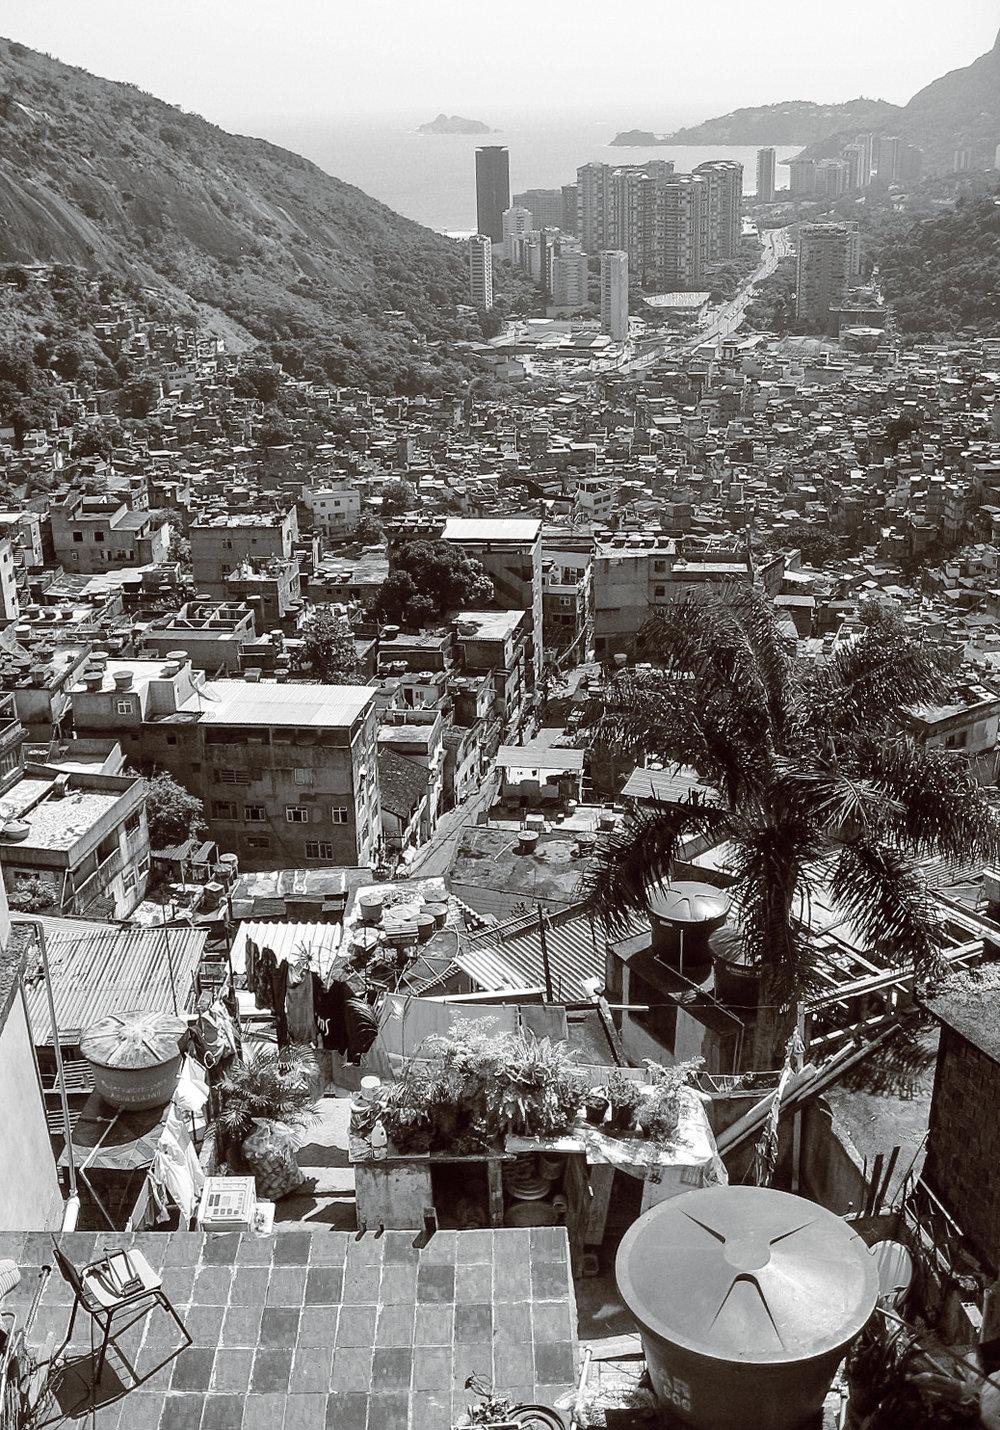 rio_rochina_favela-tour-311-rooftop-view-towards-coast.jpg